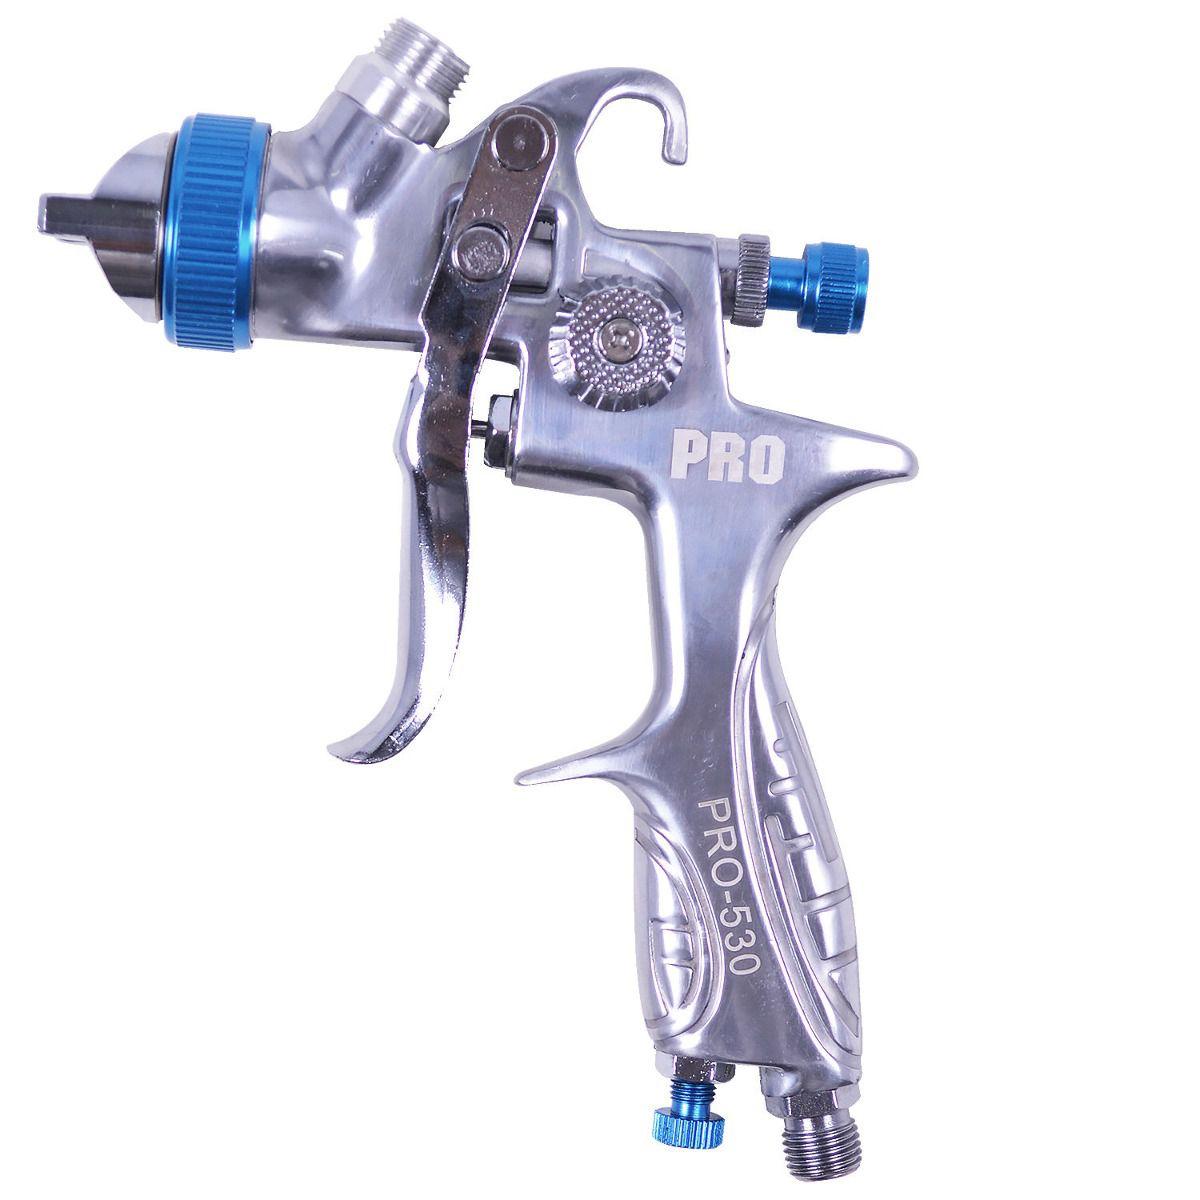 Pistola de Pintura Gravidade HVLP 1.3  600ml Pro-530 LDR-Pro